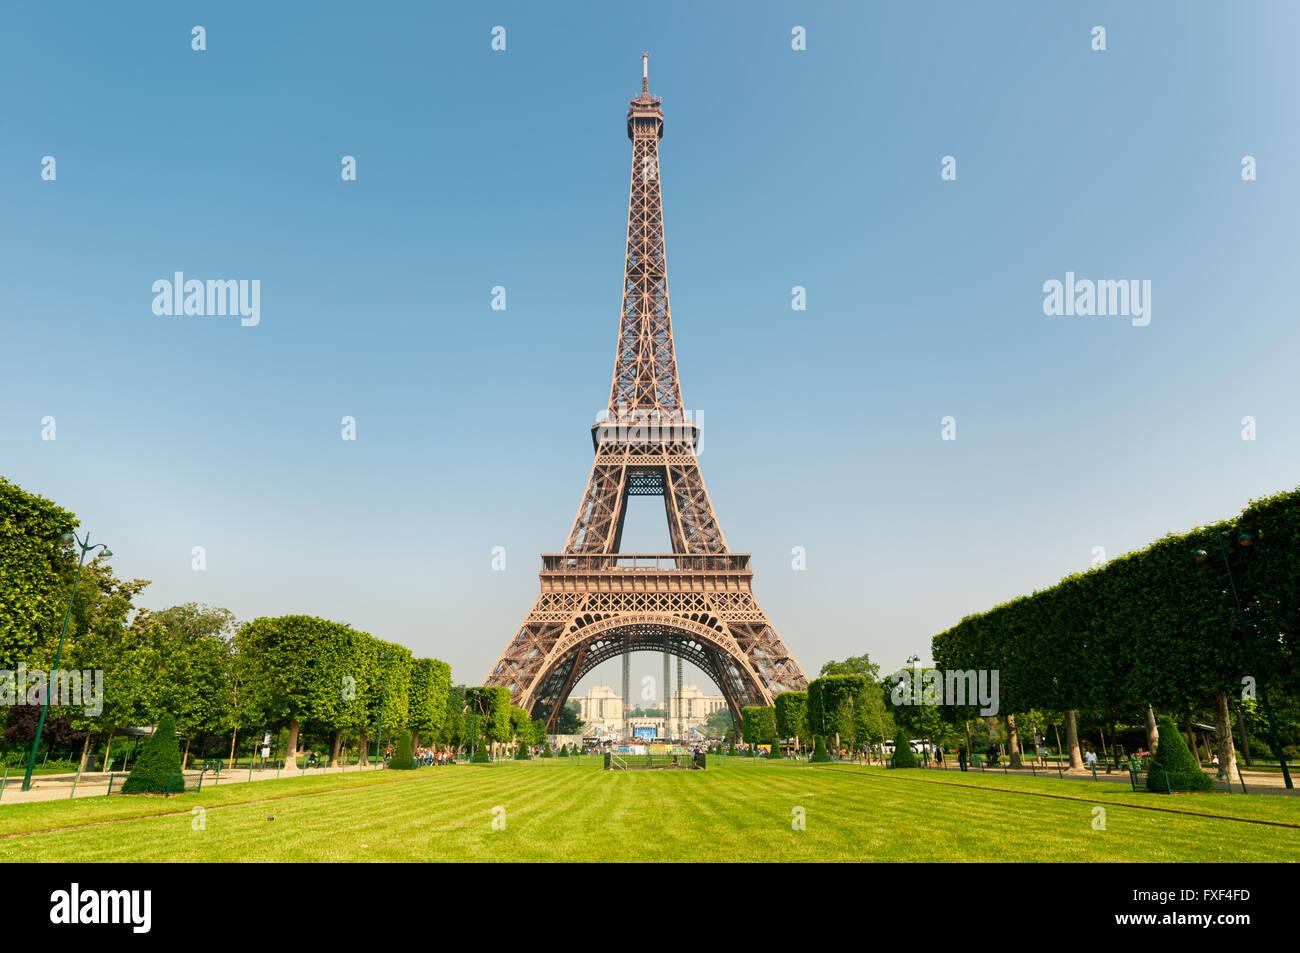 Eiffel Tower, Paris, France. - Stock Image